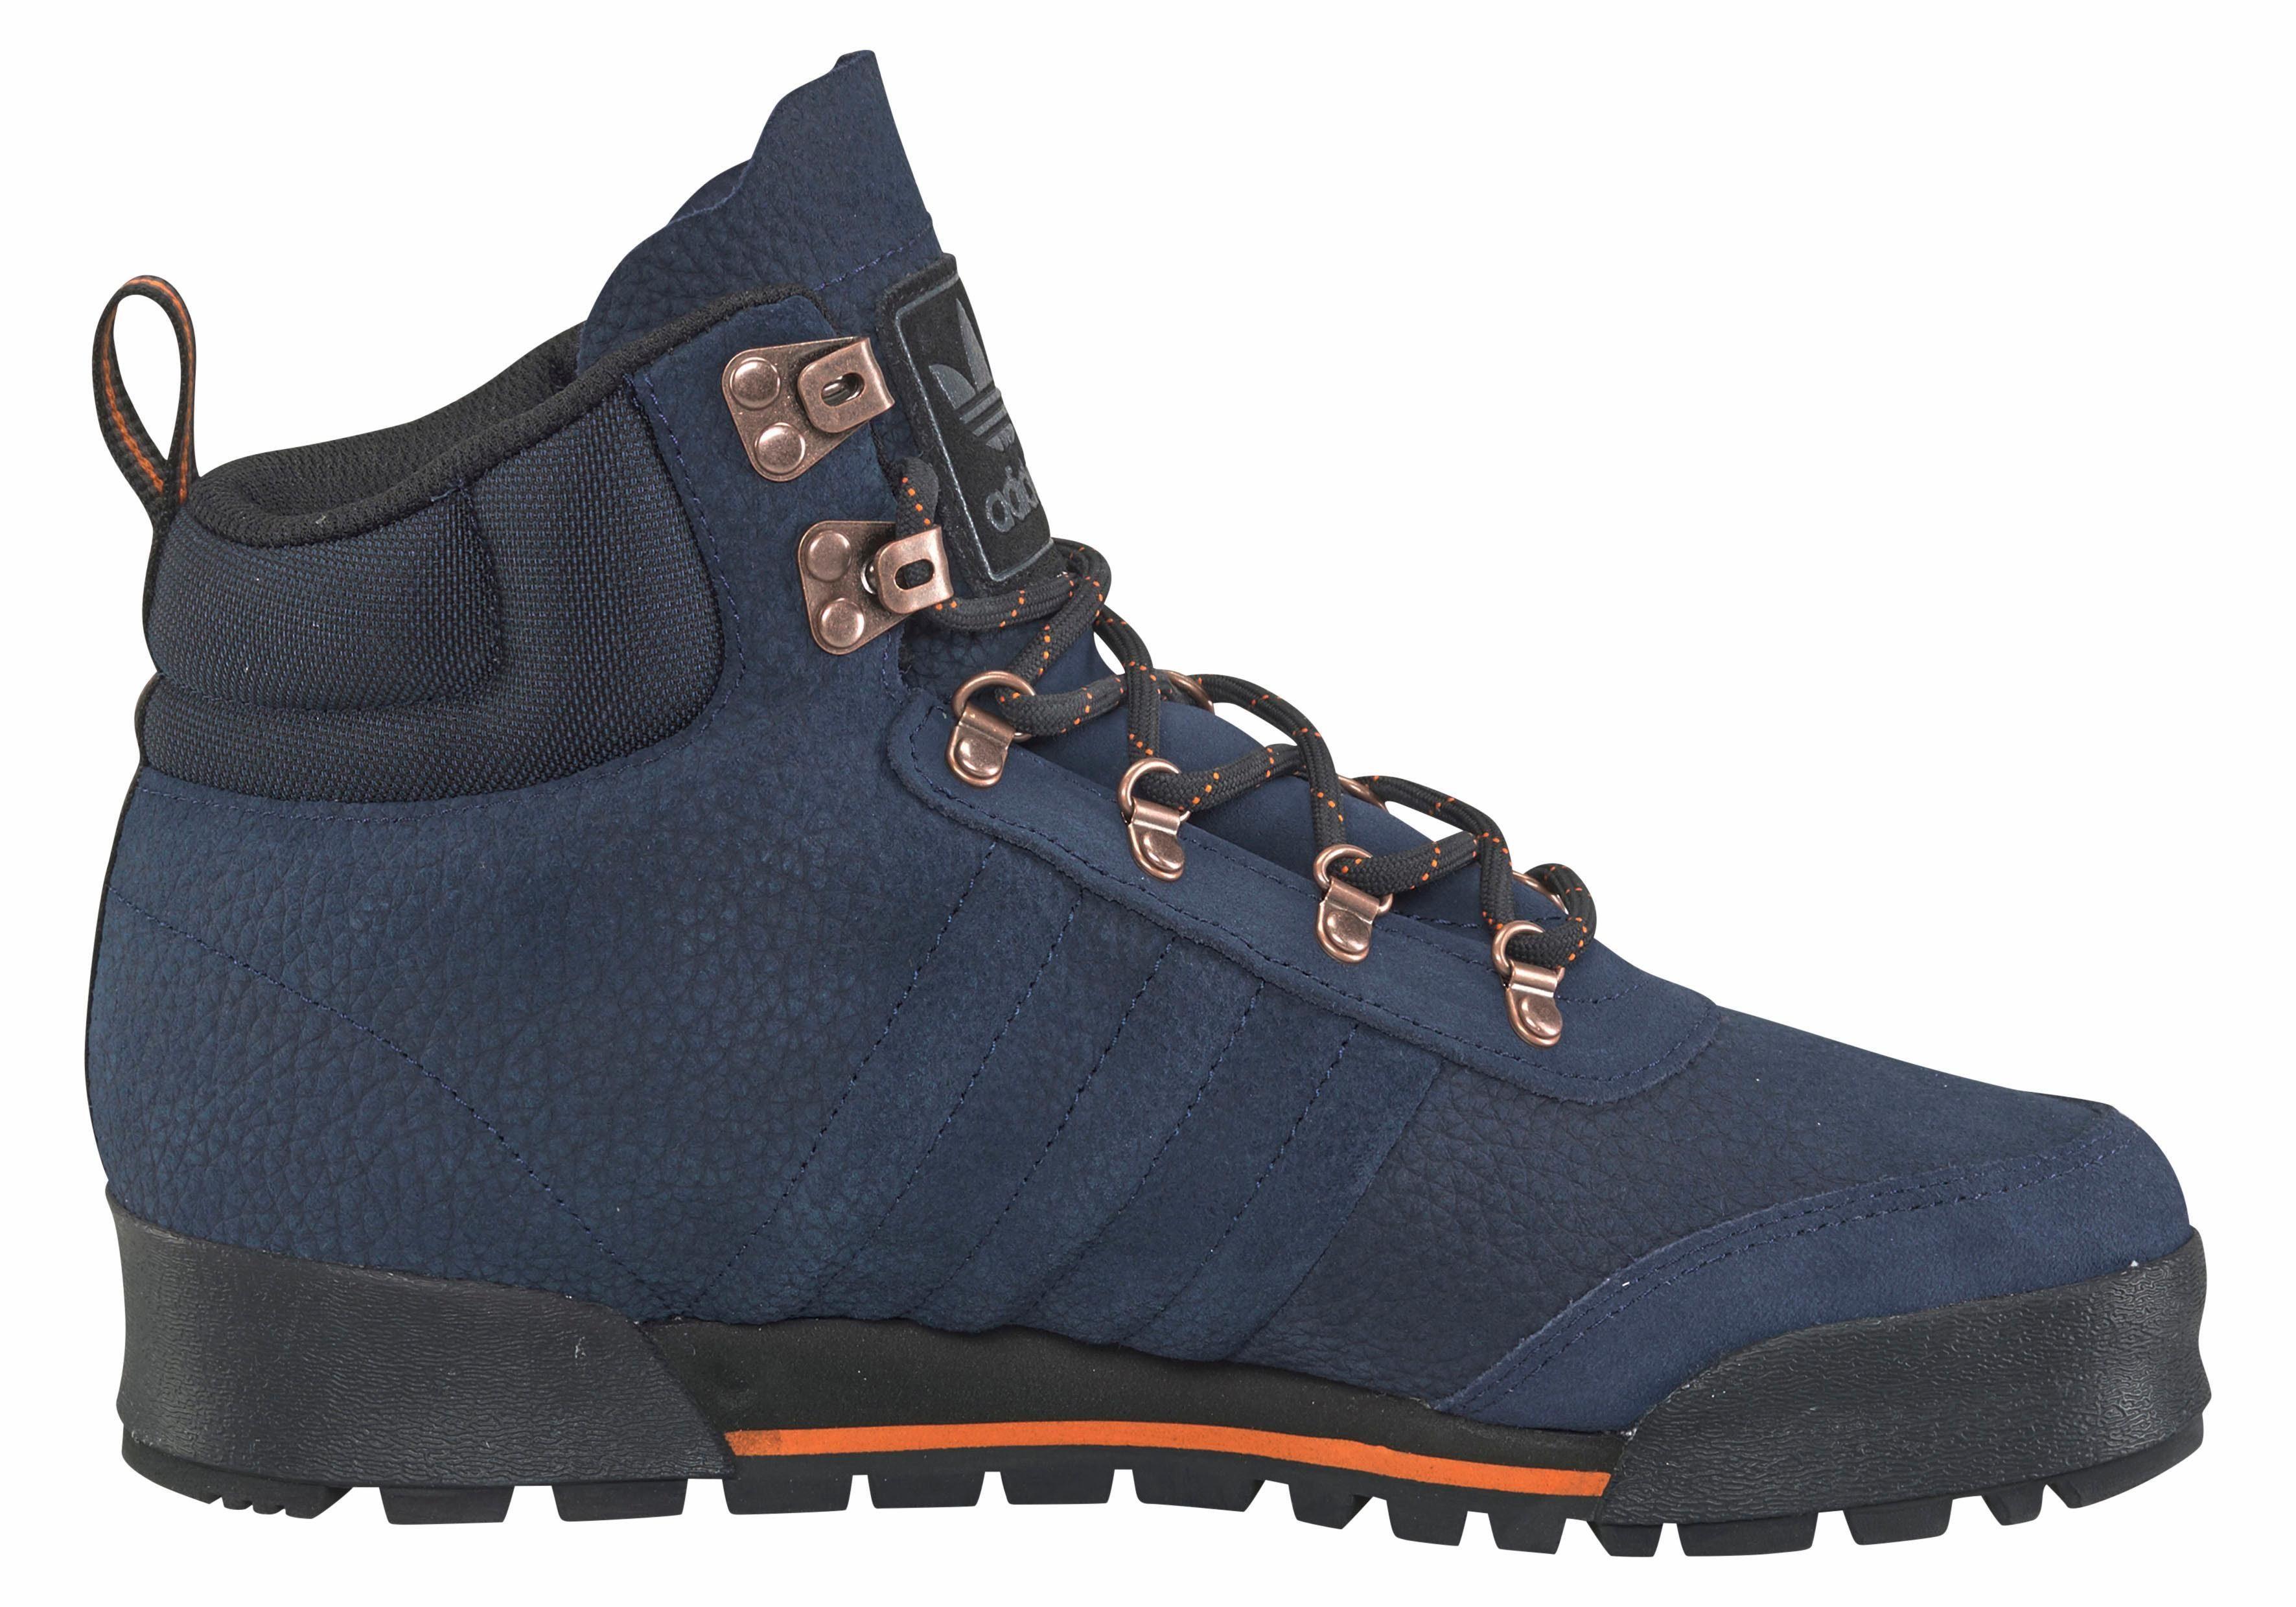 Adidas Jake 2.0 Chaussures Bateau Stiefel Bleu Bleu bVNARqO3M